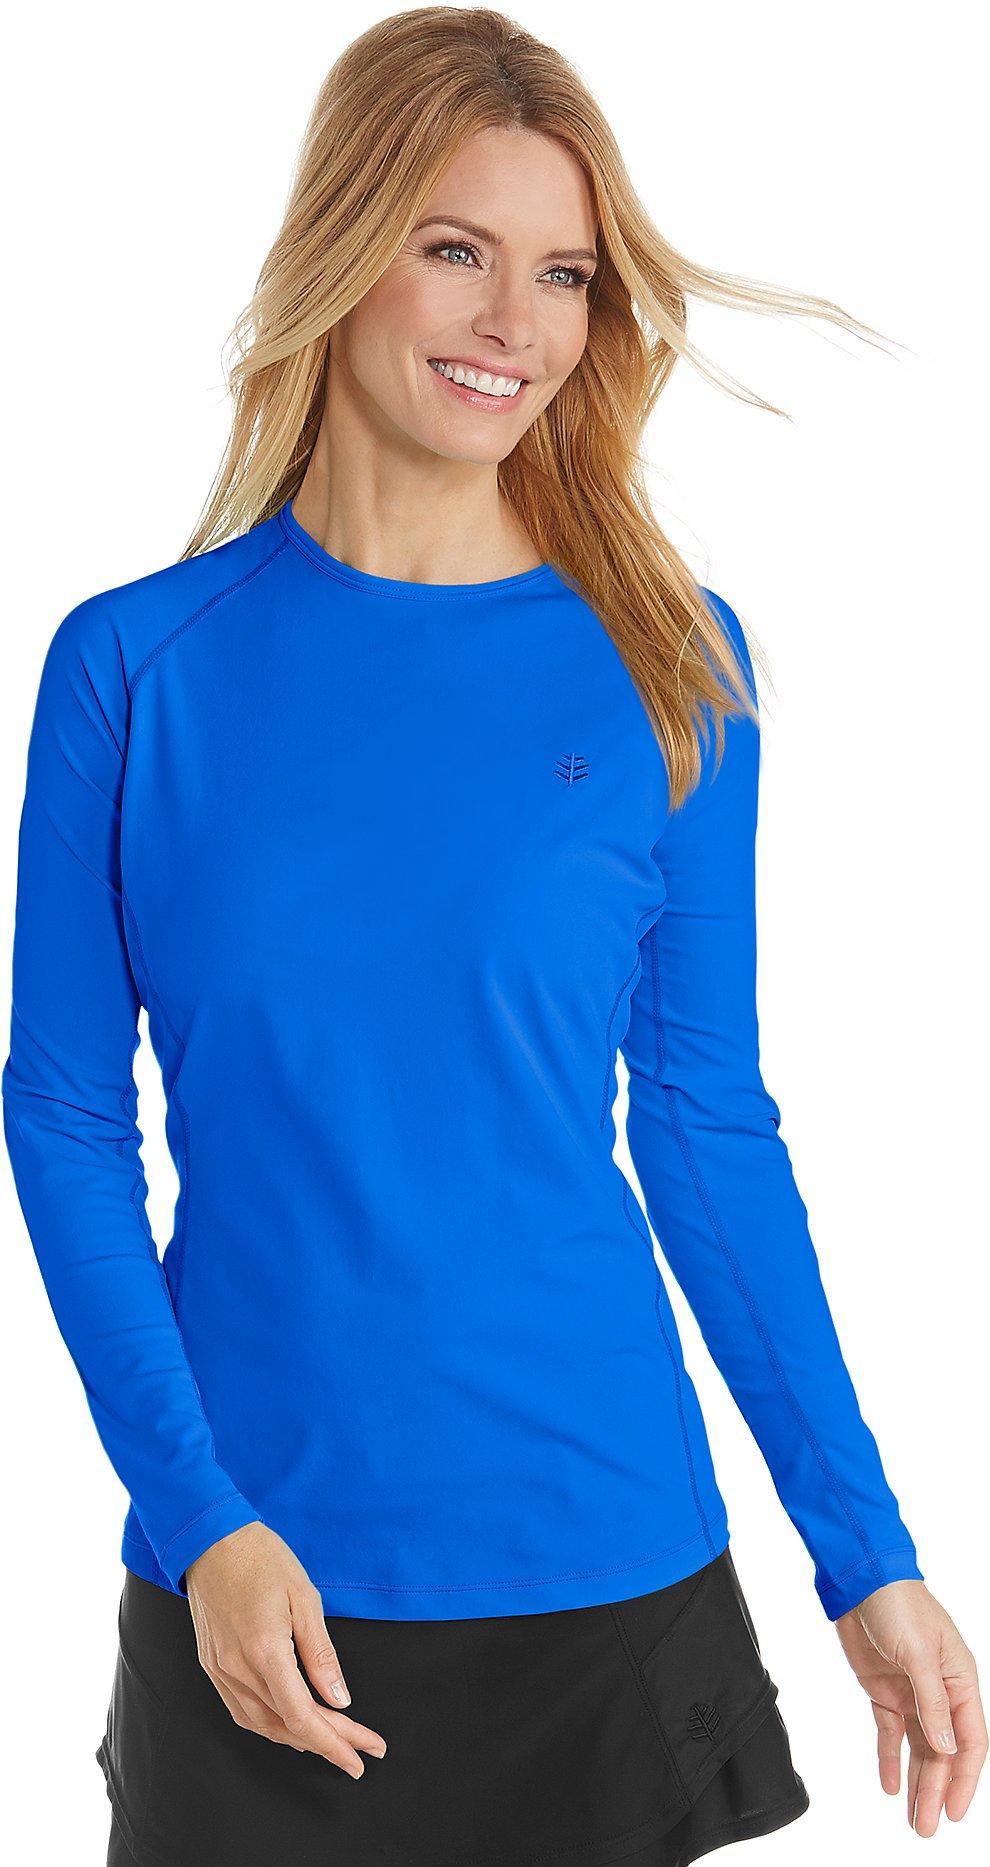 Coolibar UPF 50+ Women's Long Sleeve Hightide Swim Shirt - Sun Protective (Large- Baja Blue) by Coolibar